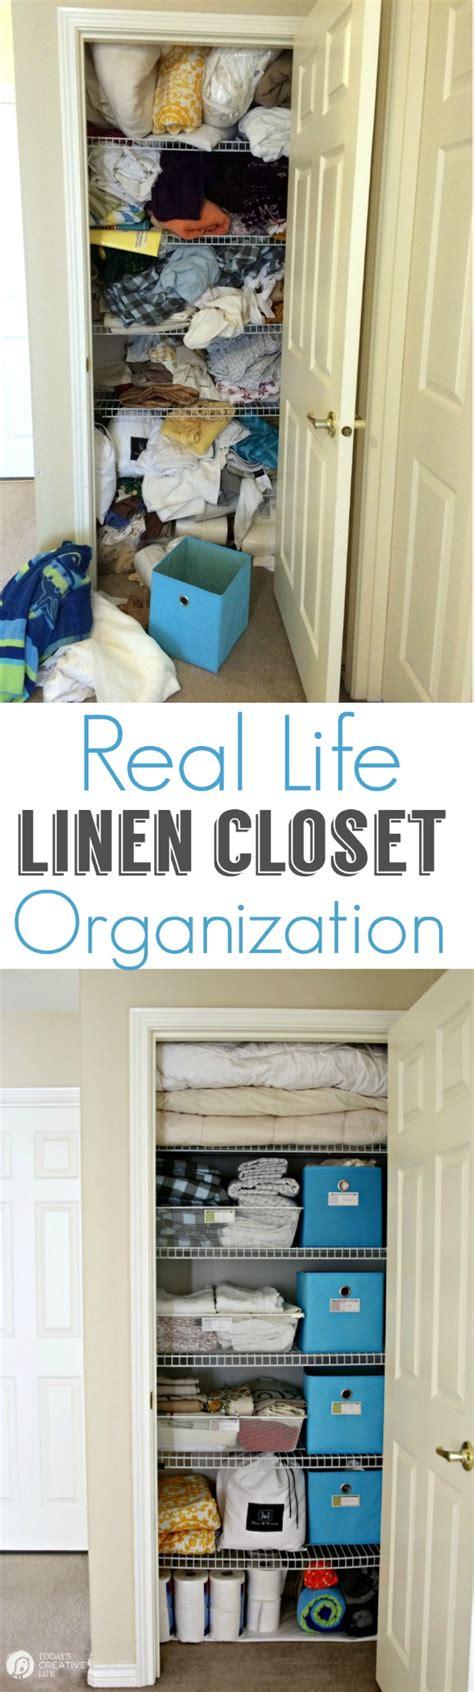 Organizing Your Linen Closet by Picturesque Organized Linen Closet Photos Roselawnlutheran